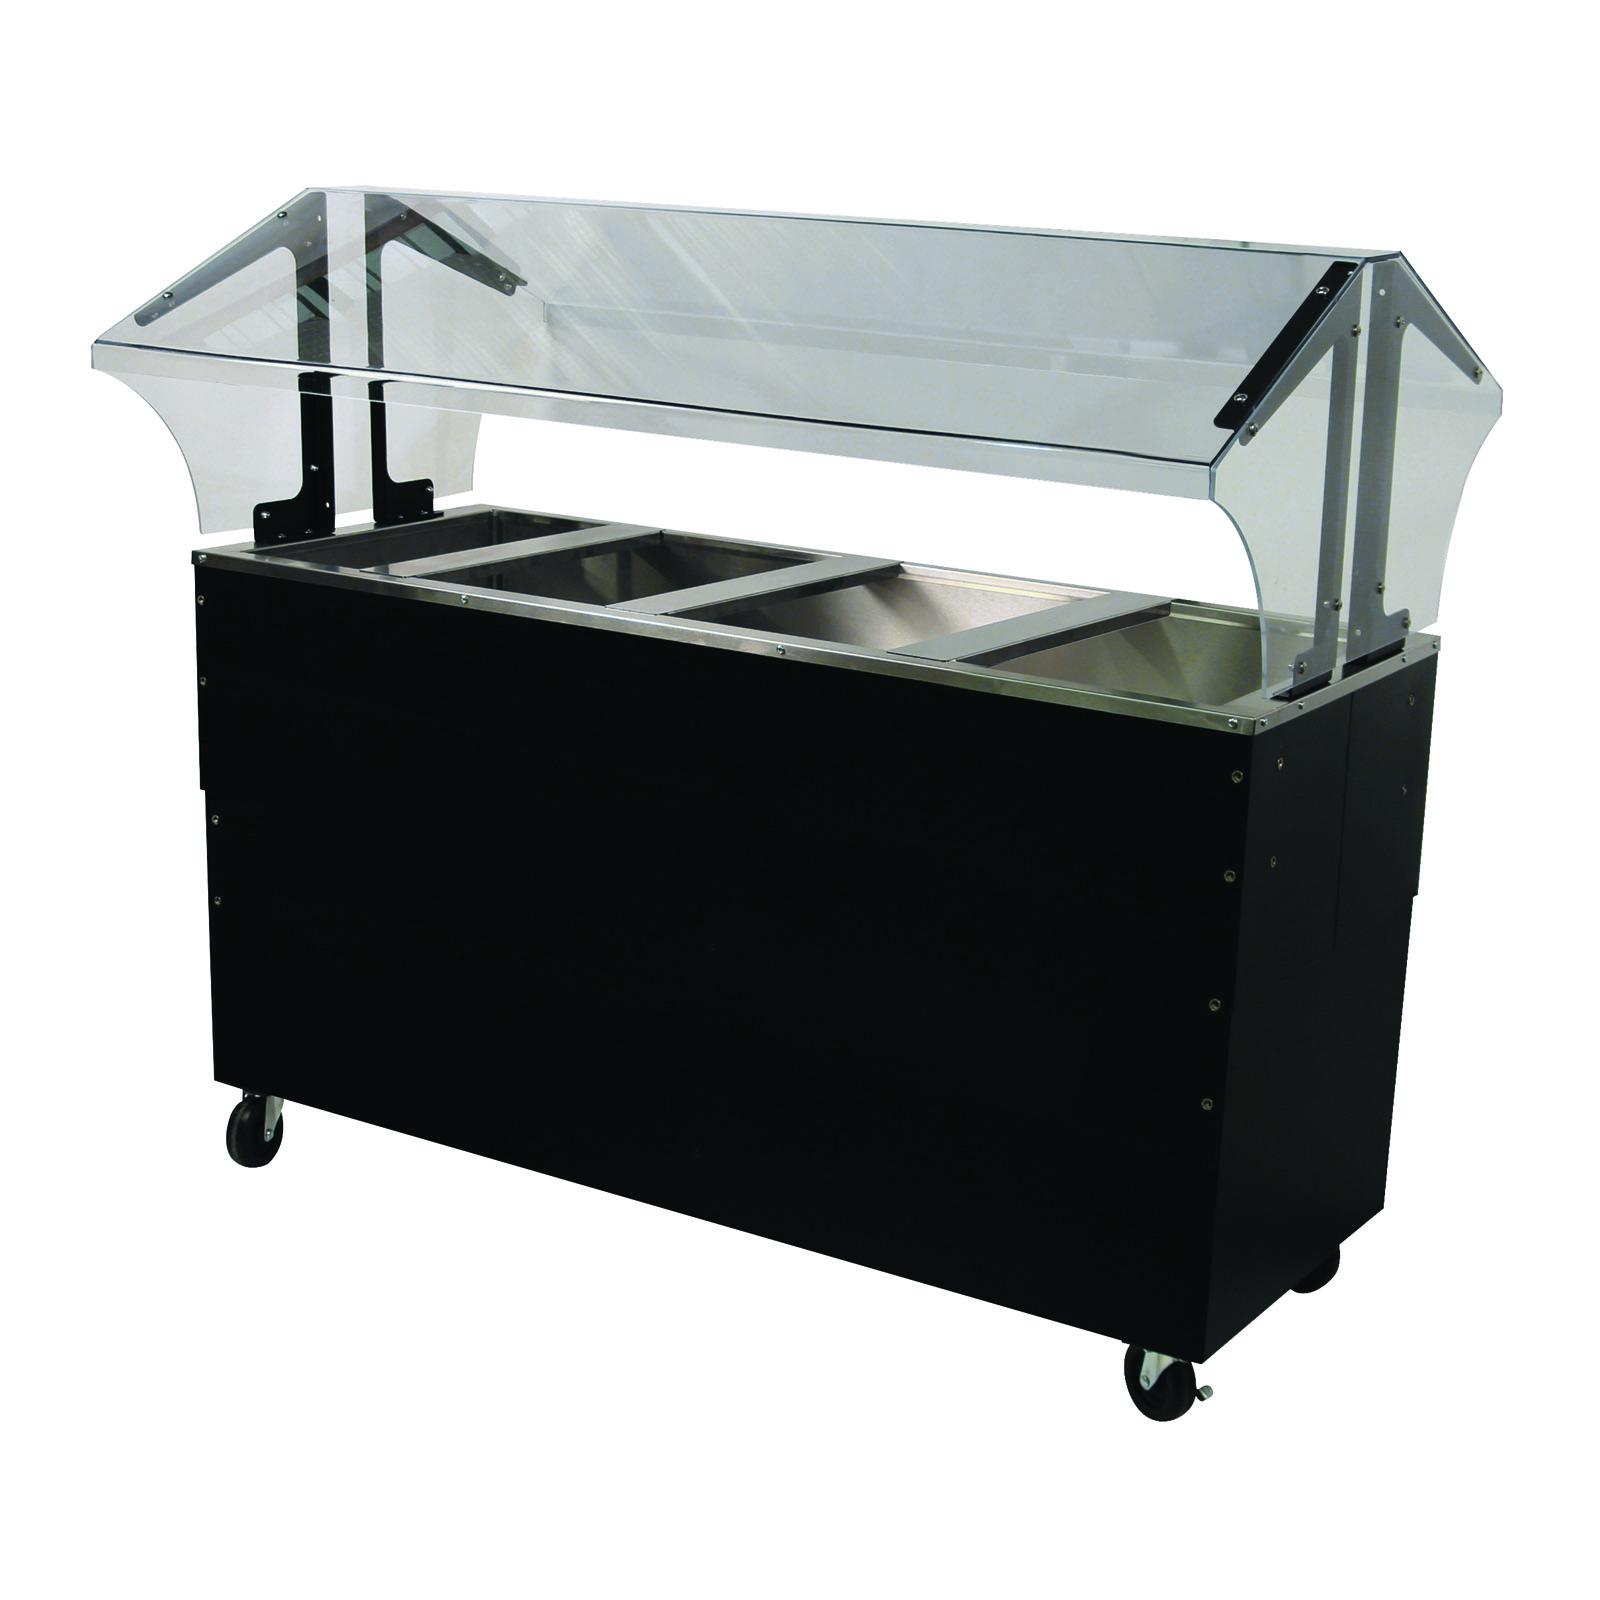 Advance Tabco B4-CPU-B-SB serving counter, cold food